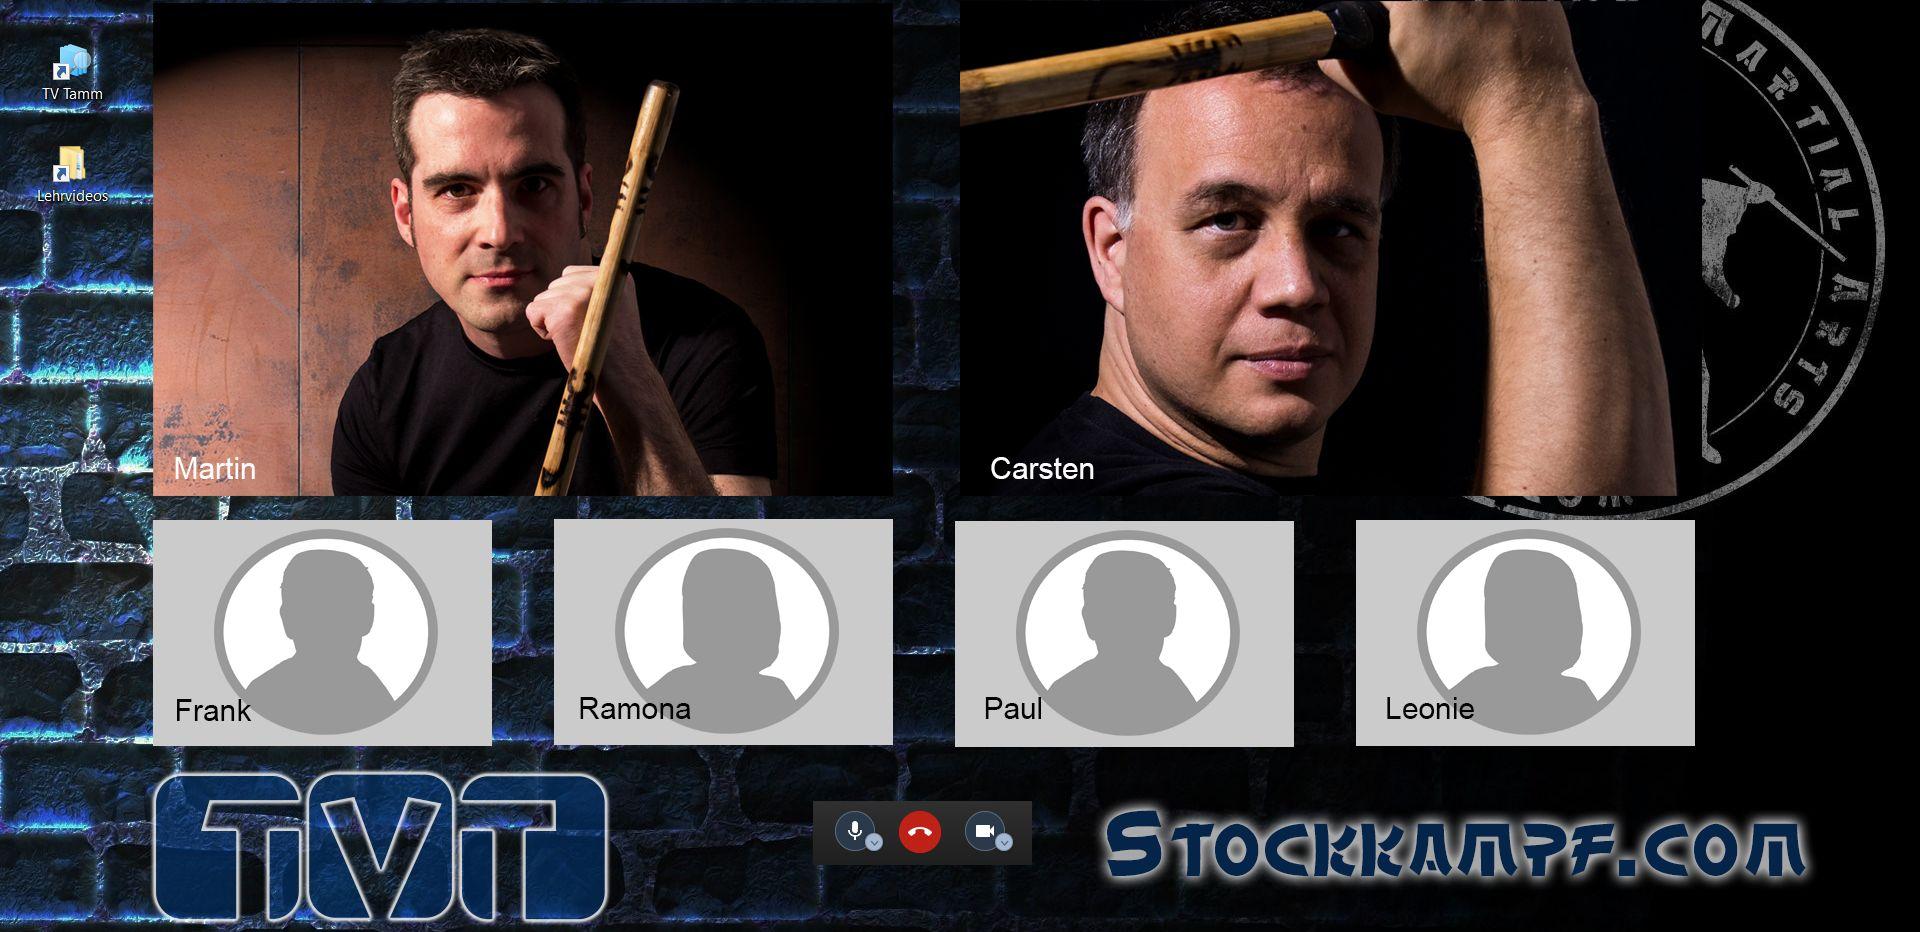 Stockkämpfer im Videochat